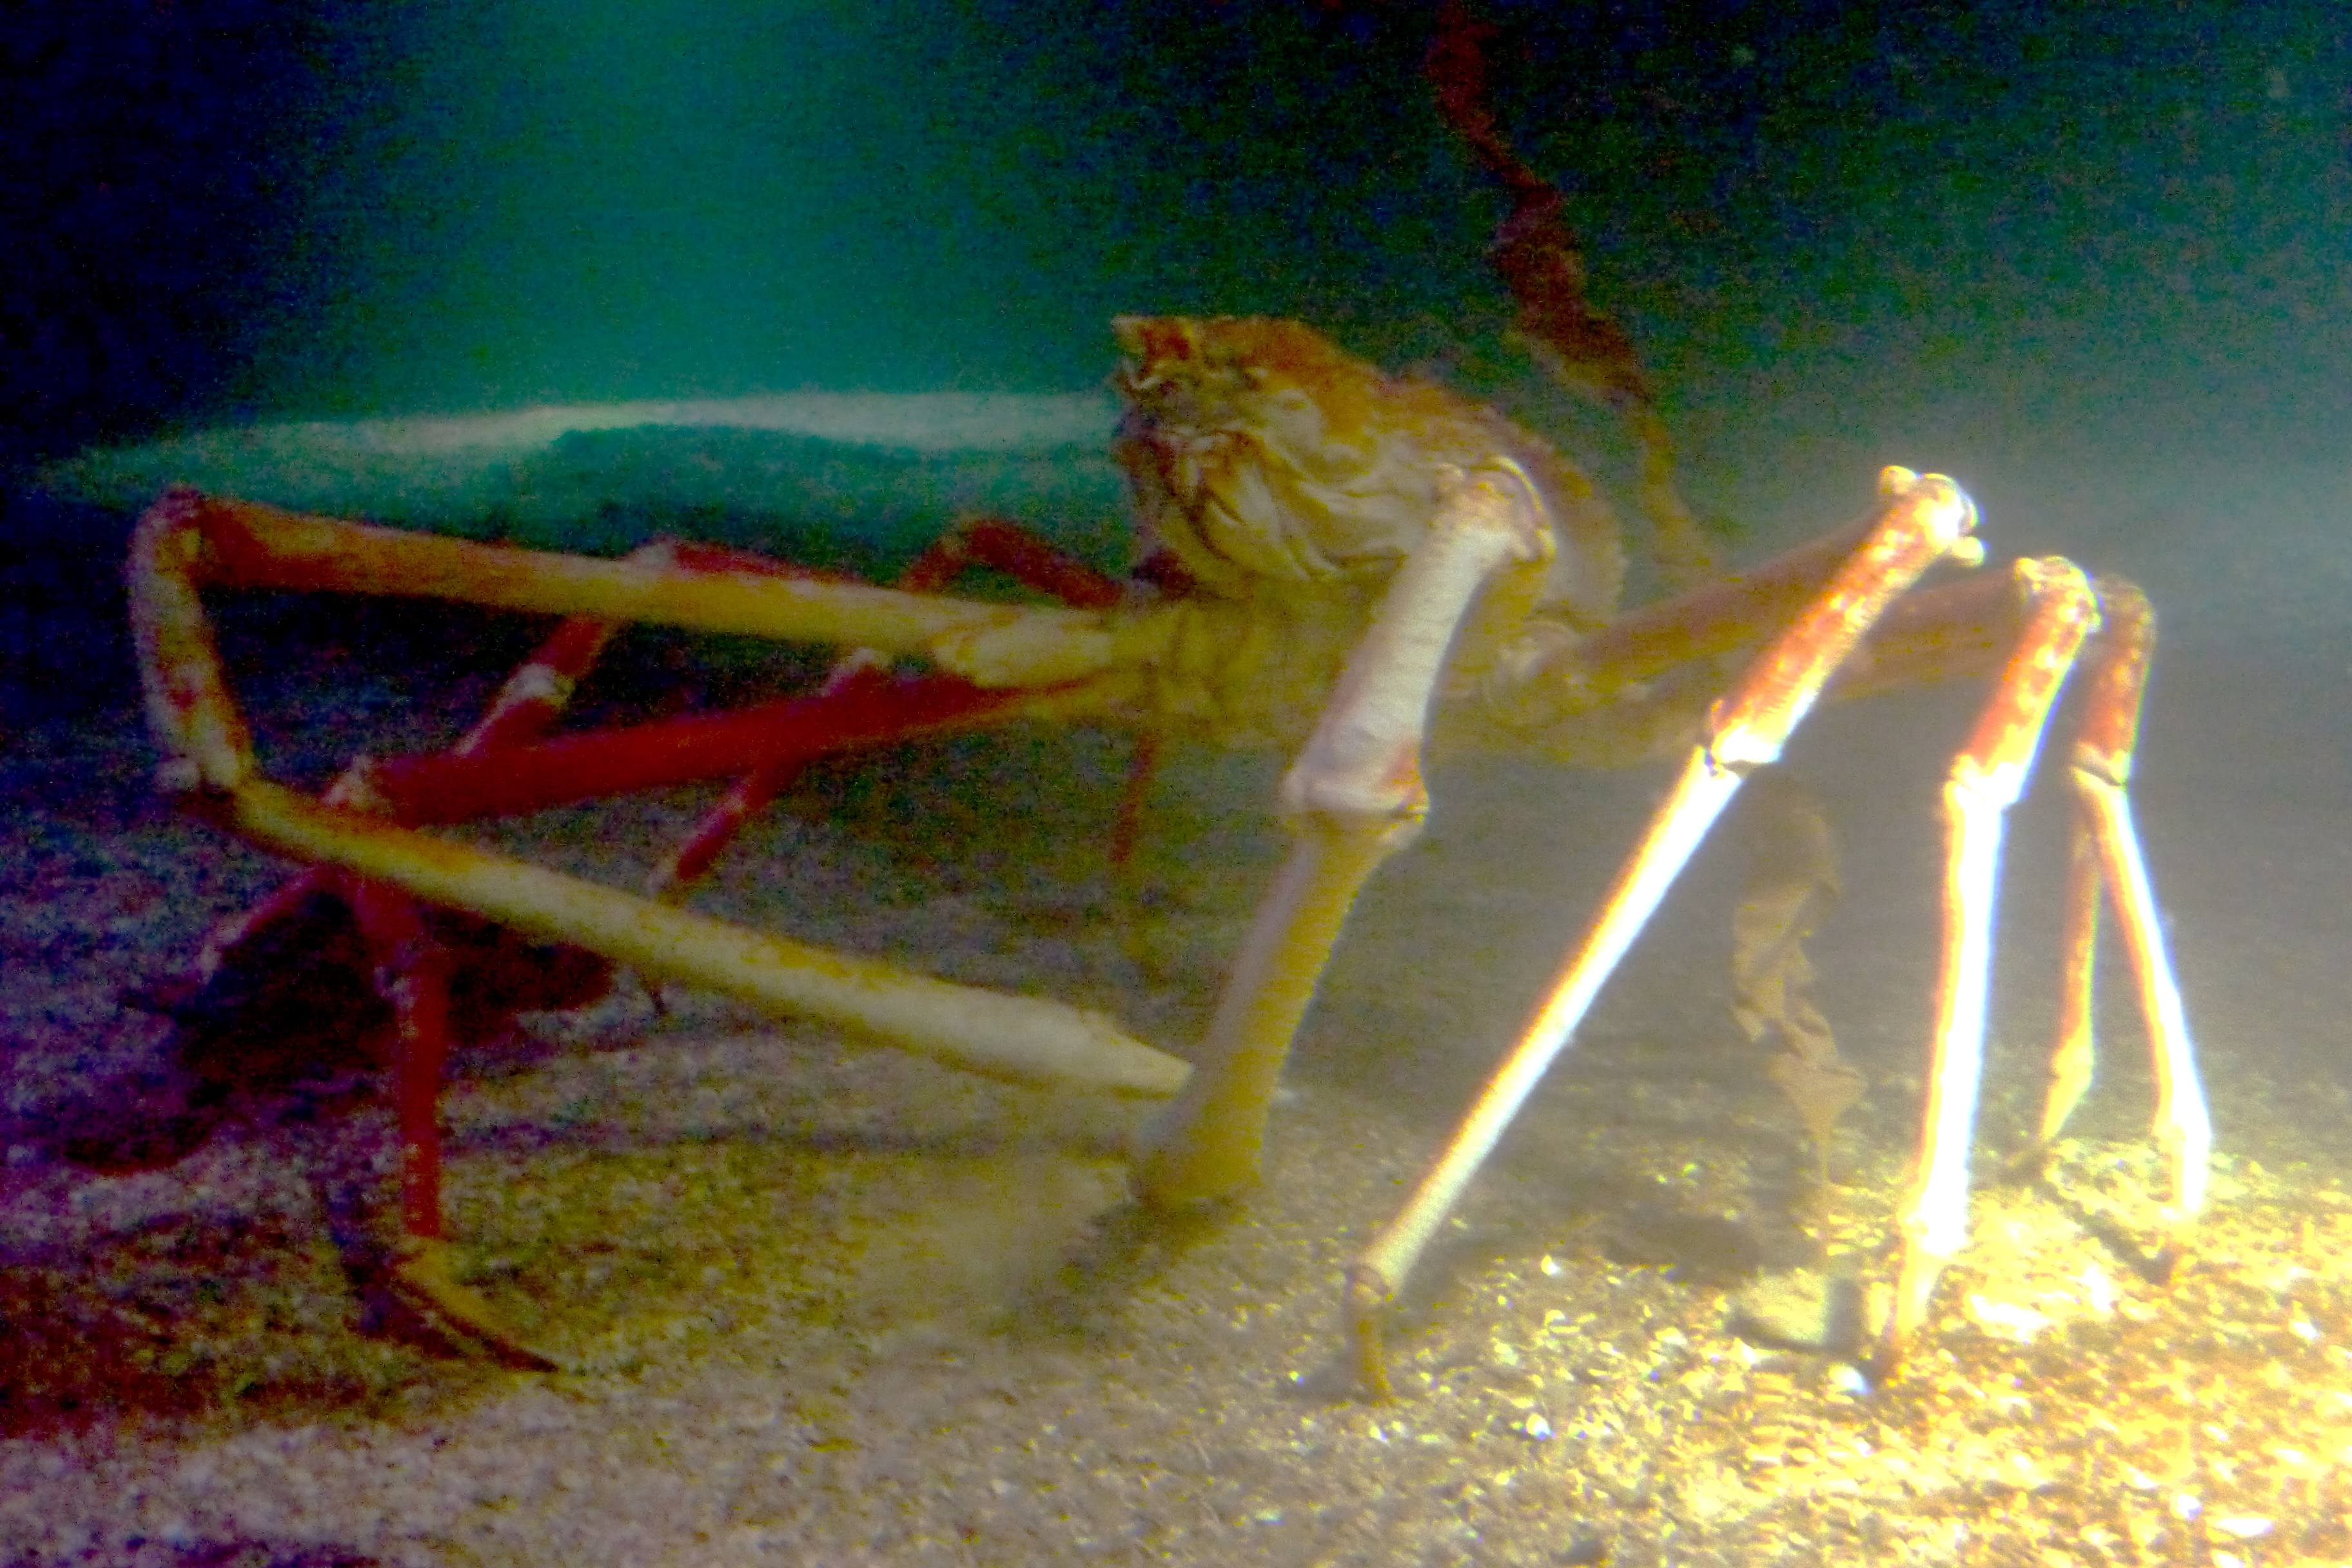 File:Crabzilla in Sea Life Scheveningen.JPG - Wikimedia Commons